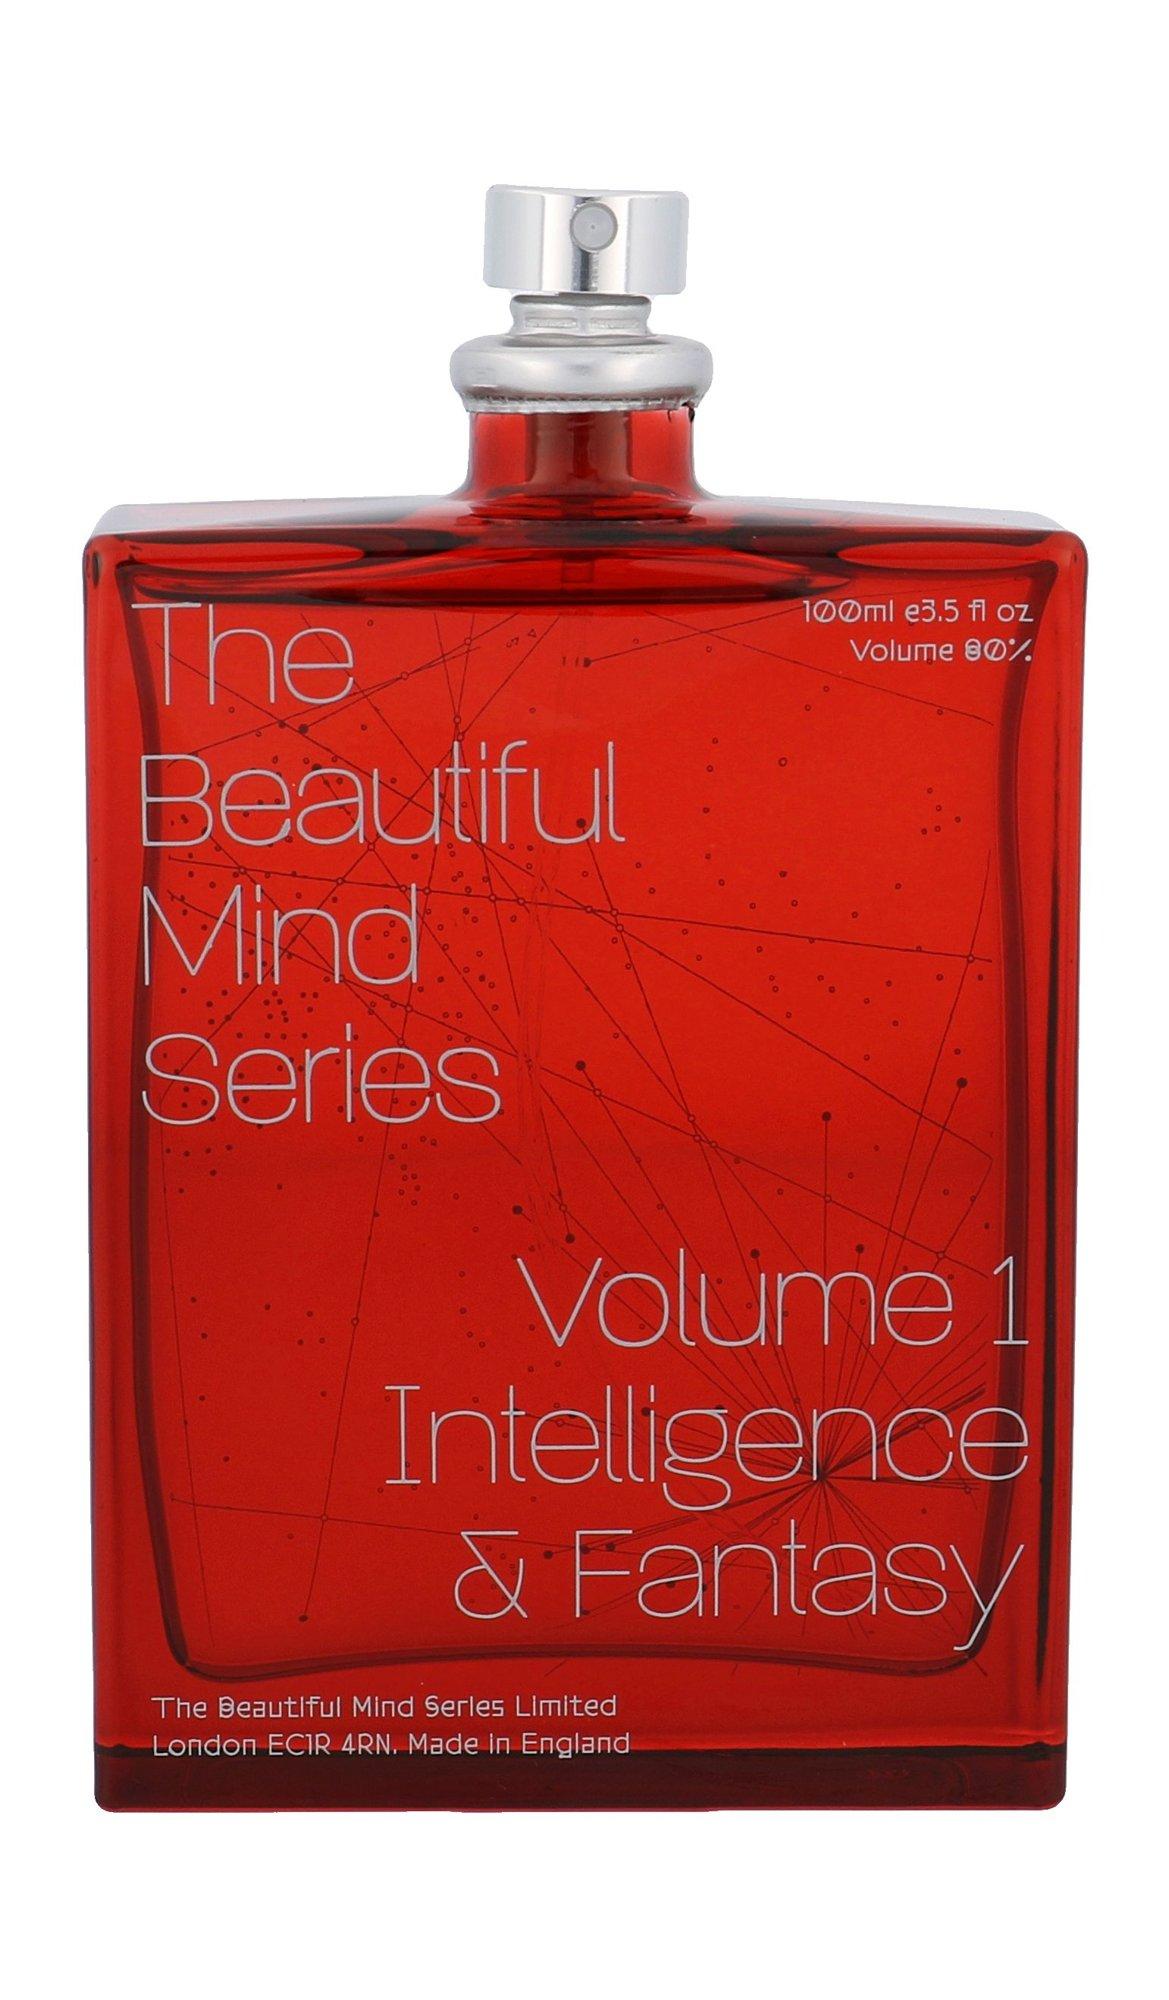 The Beautiful Mind Series Volume 1: Intelligence & Fantasy EDT 100ml